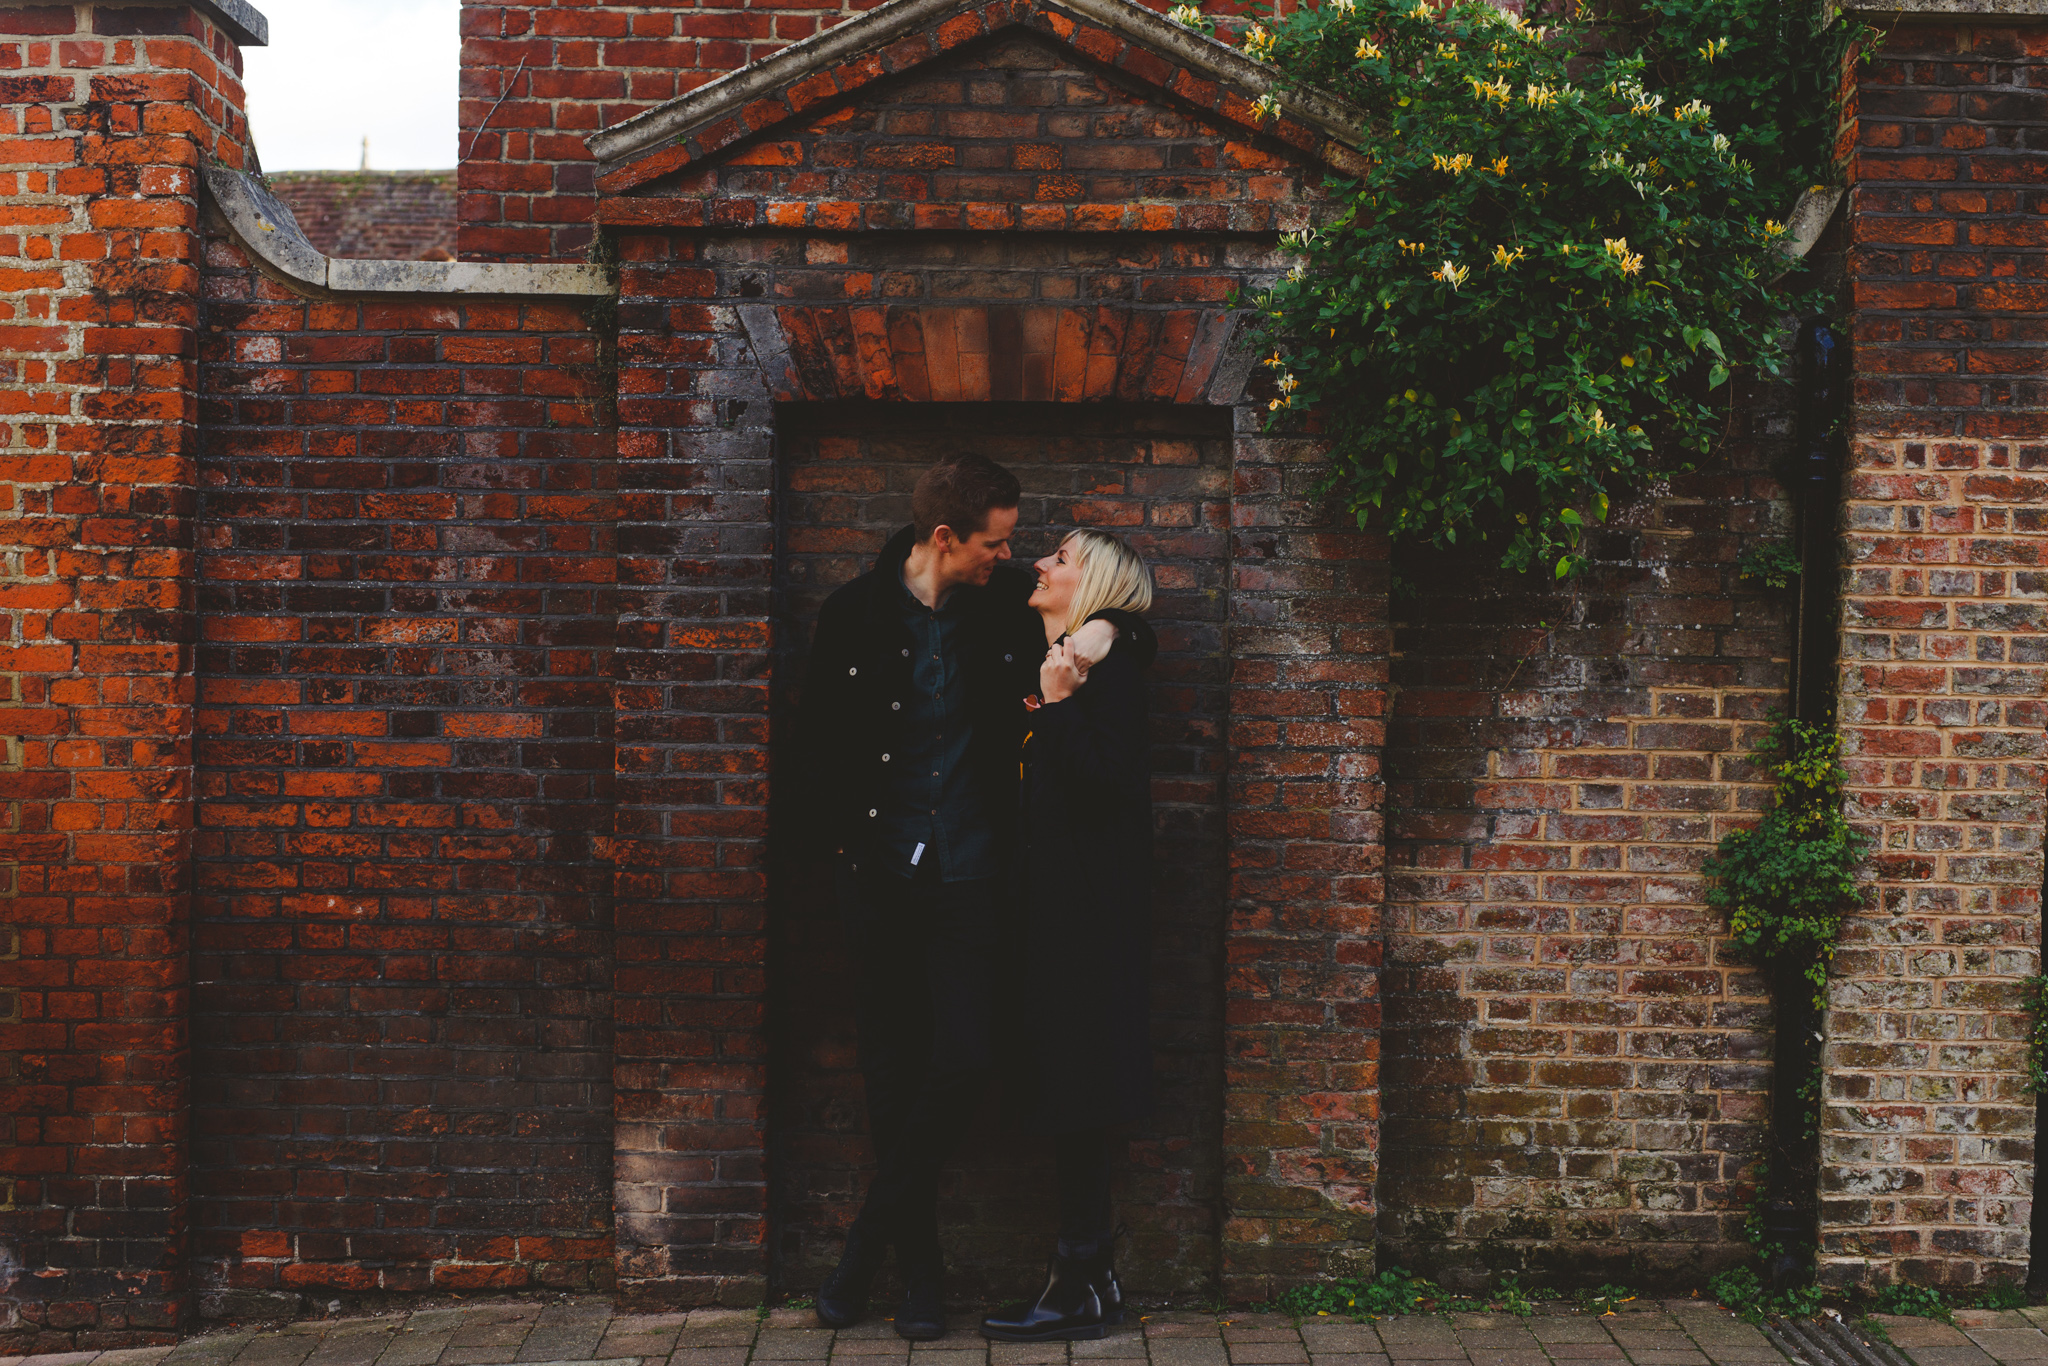 derbyshire-wedding-photographer-camera-hannah-22.jpg